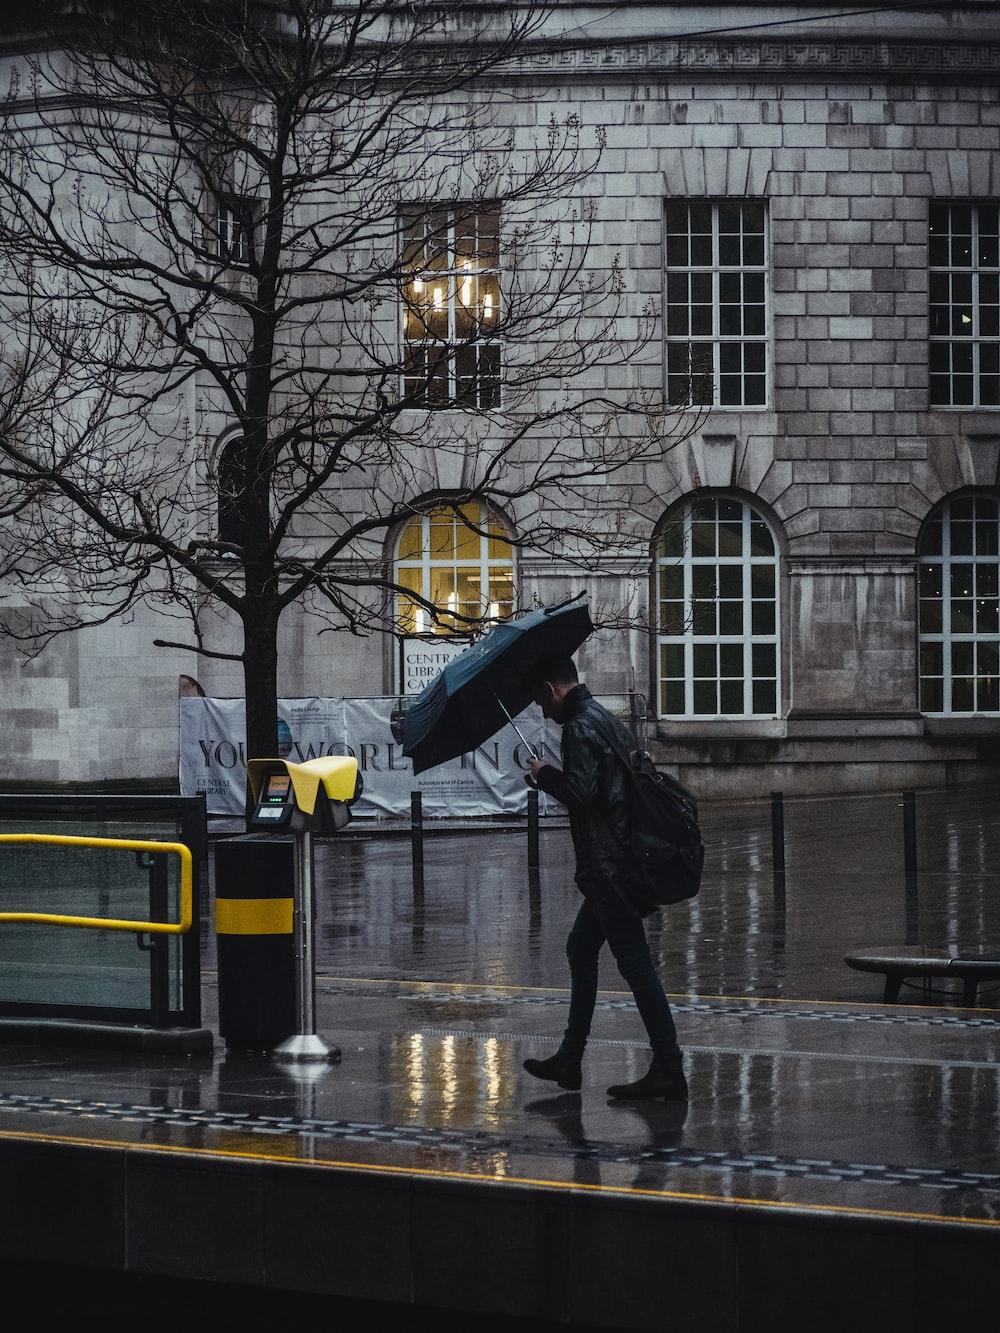 person in black jacket and black pants holding umbrella walking on sidewalk during daytime